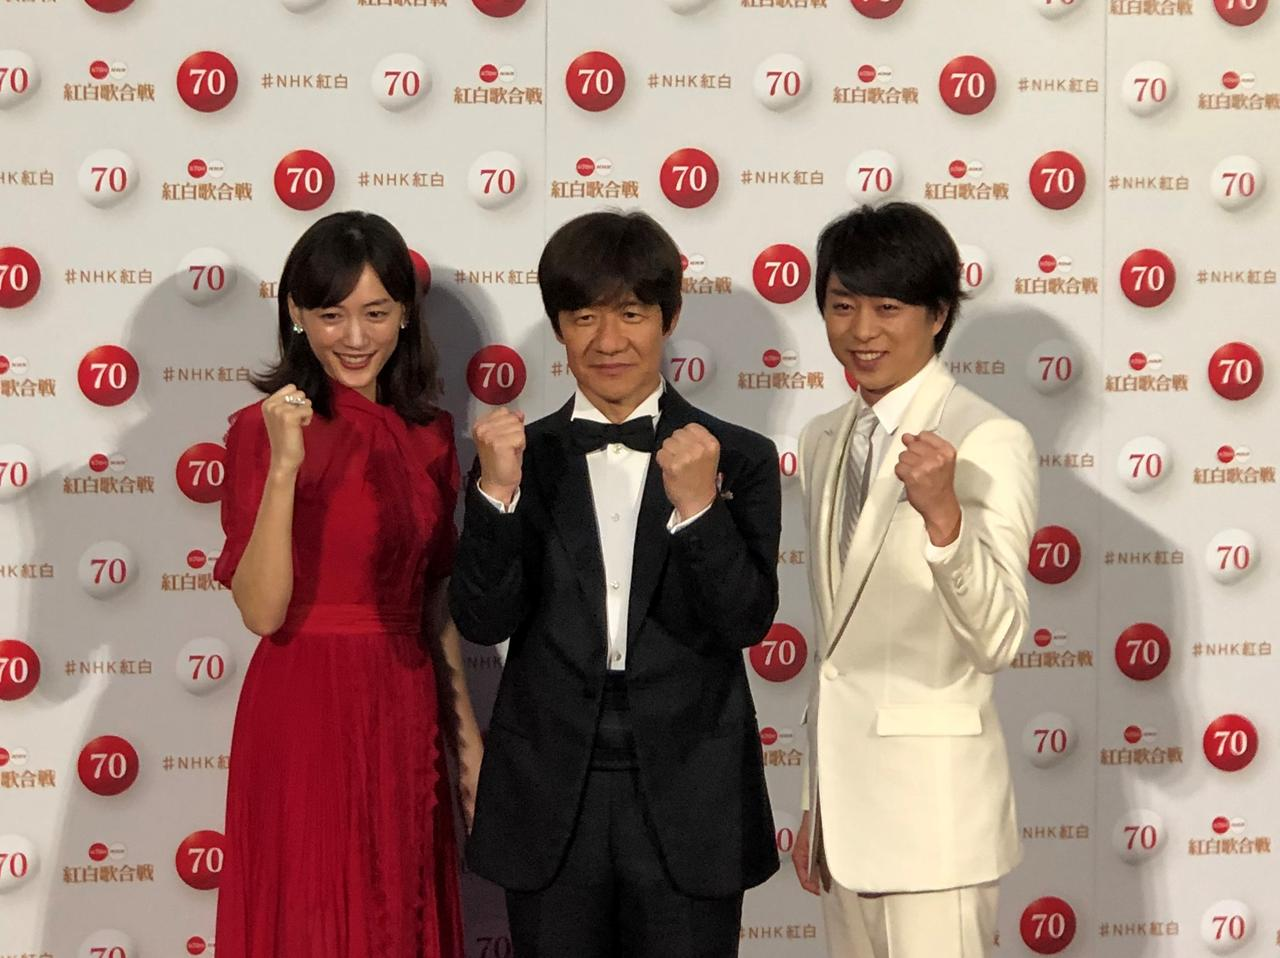 NHK紅白歌合戦2019 司會者が勢ぞろい。笑いが絶えない會見に ...